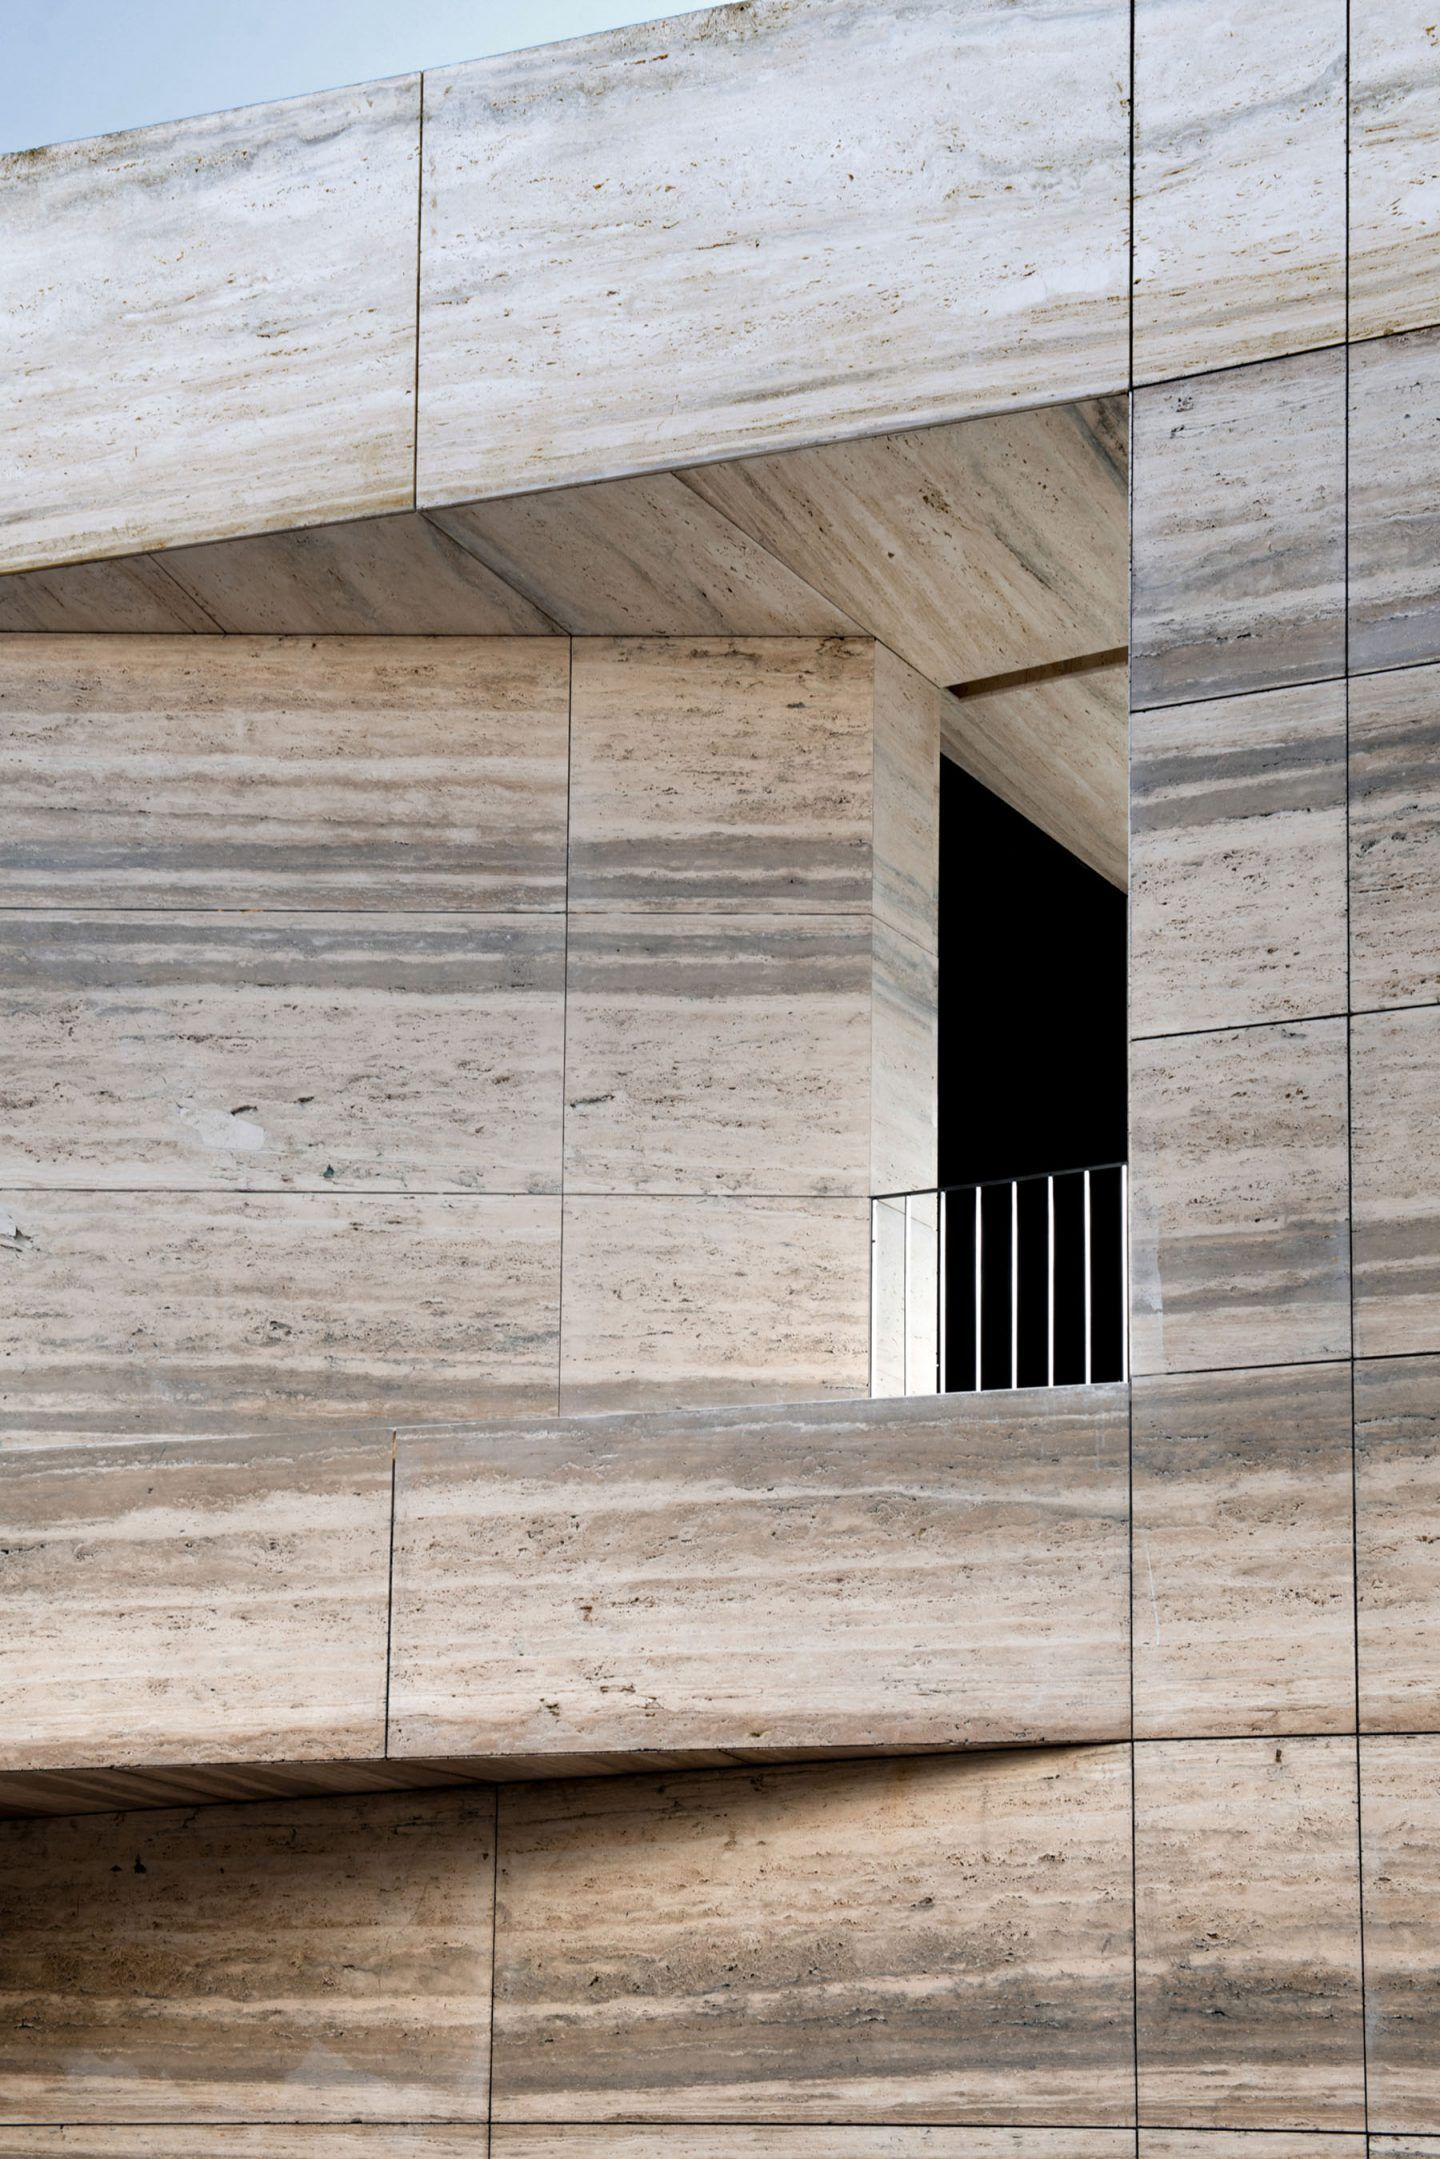 IGNANT-Travel-Esrawe-Studio-Arca-Store-Jaime-Navarro-19